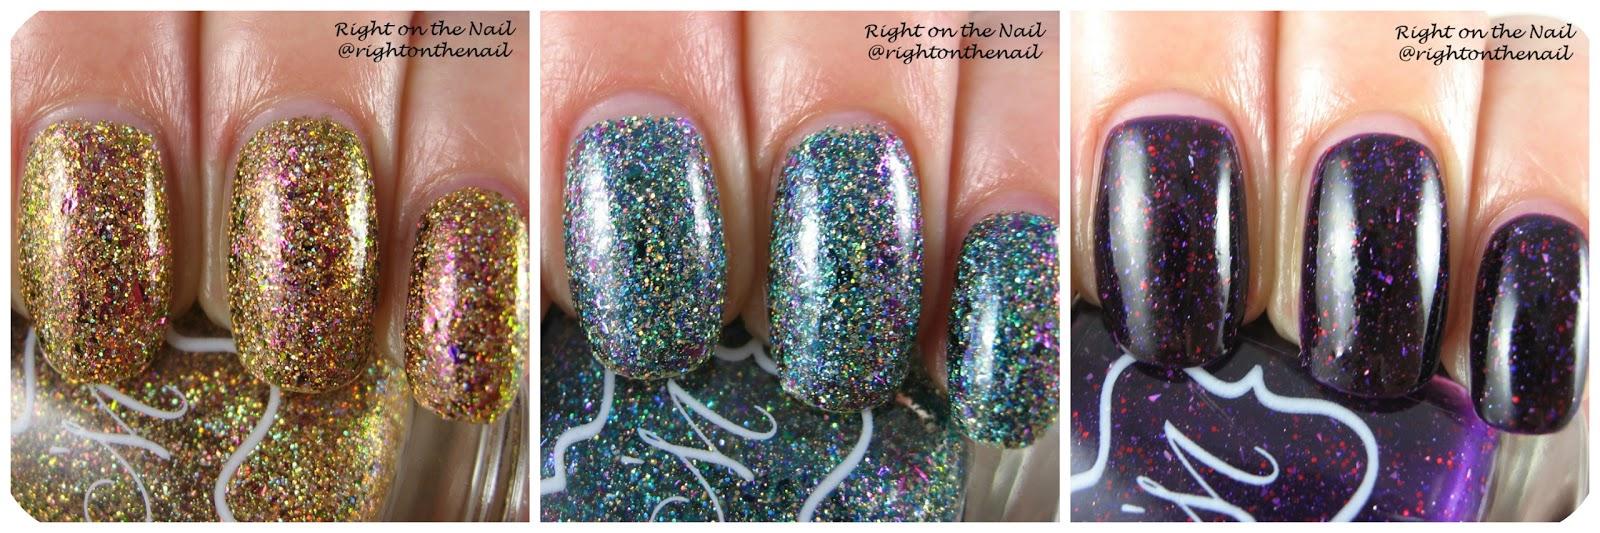 Right on the Nail: Right on the Nail ~ Polish \'M Fall 2015 ...